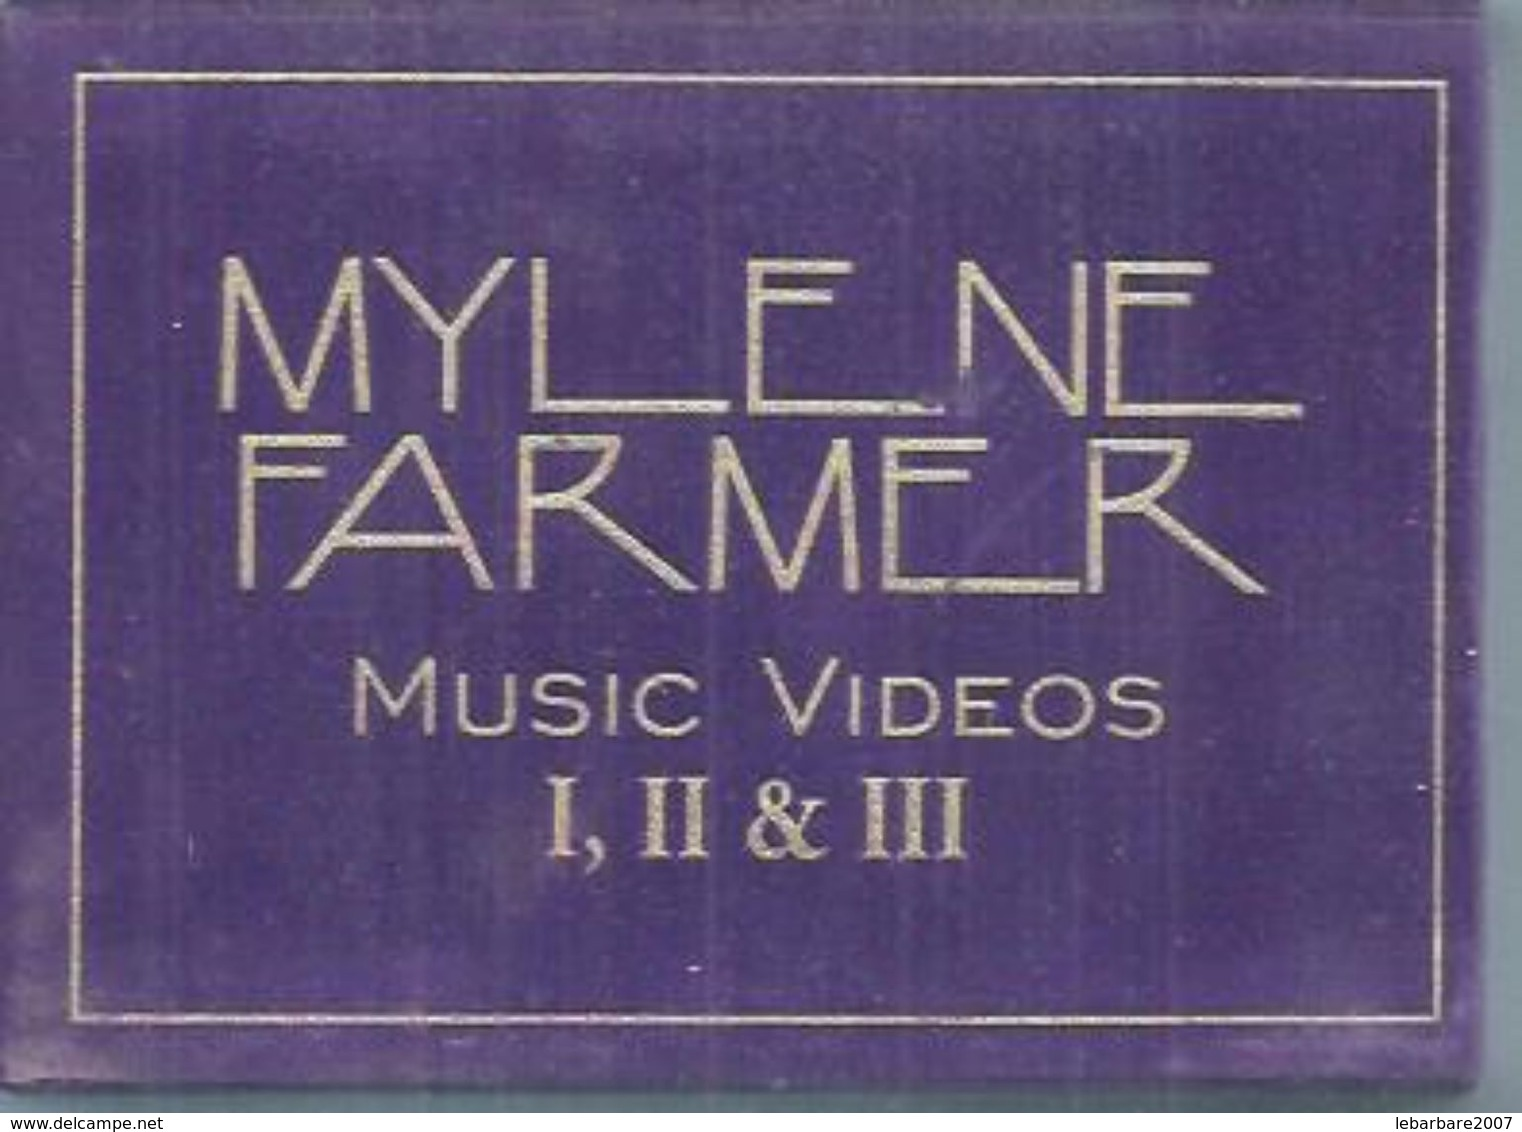 "K7 VIDEO  -  MYLENE FARMER   "" MUSIC VIDEOS I, II & III "" - ( 3 VIDEOS Boitier Cartonné VELOURS VIOLET - LUXE ) - Concert Et Musique"